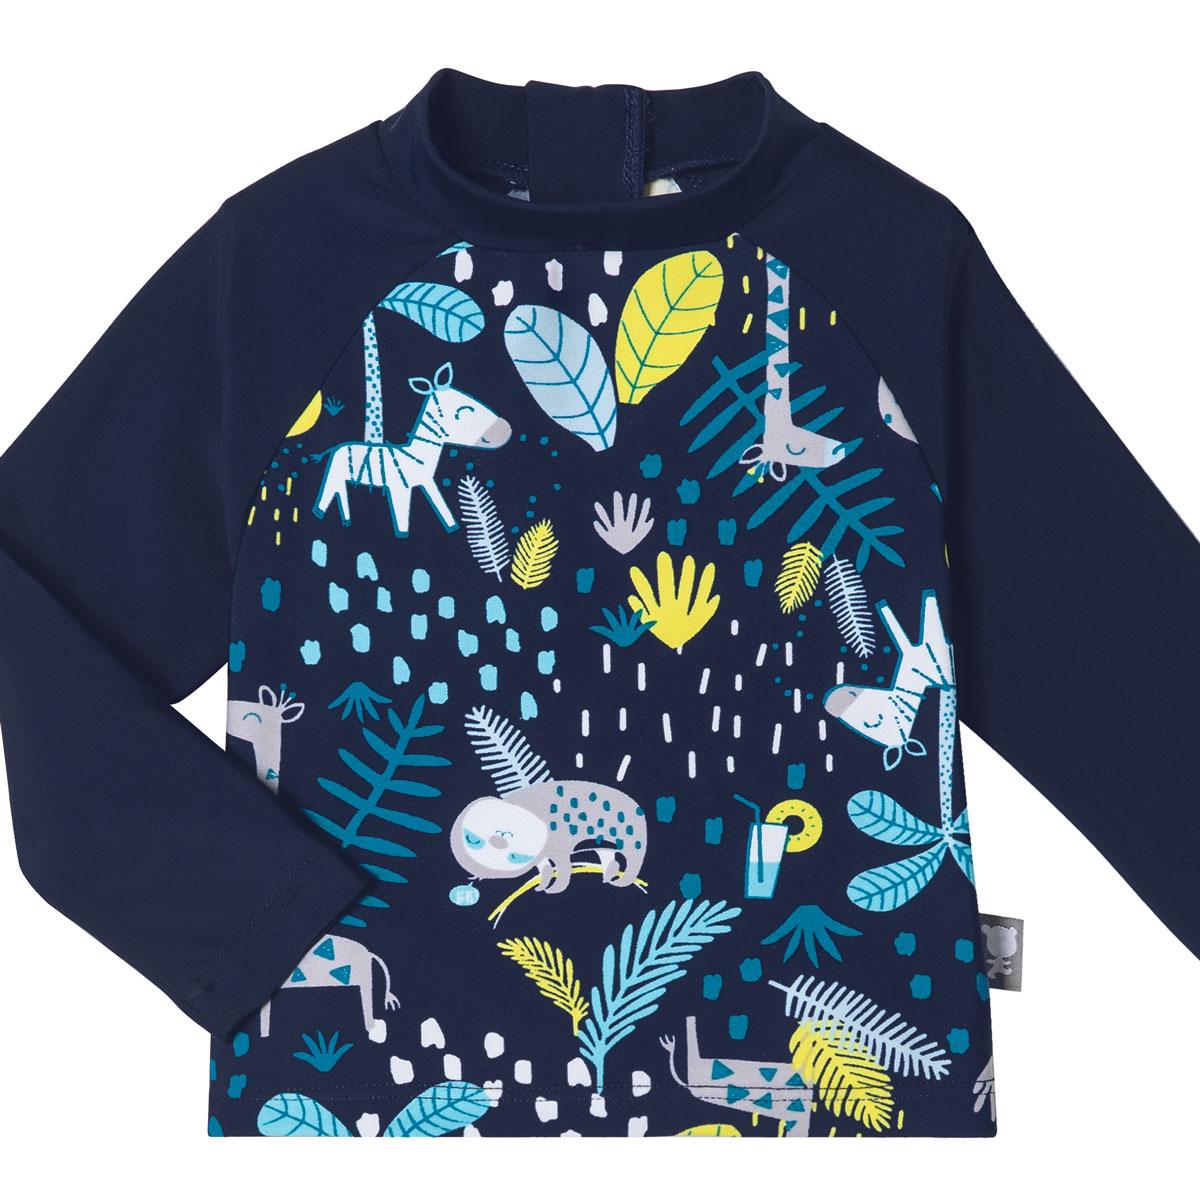 Maillot de bain bébé garçon ANTI-UV 2 pièces t-shirt & boxer Pampa haut